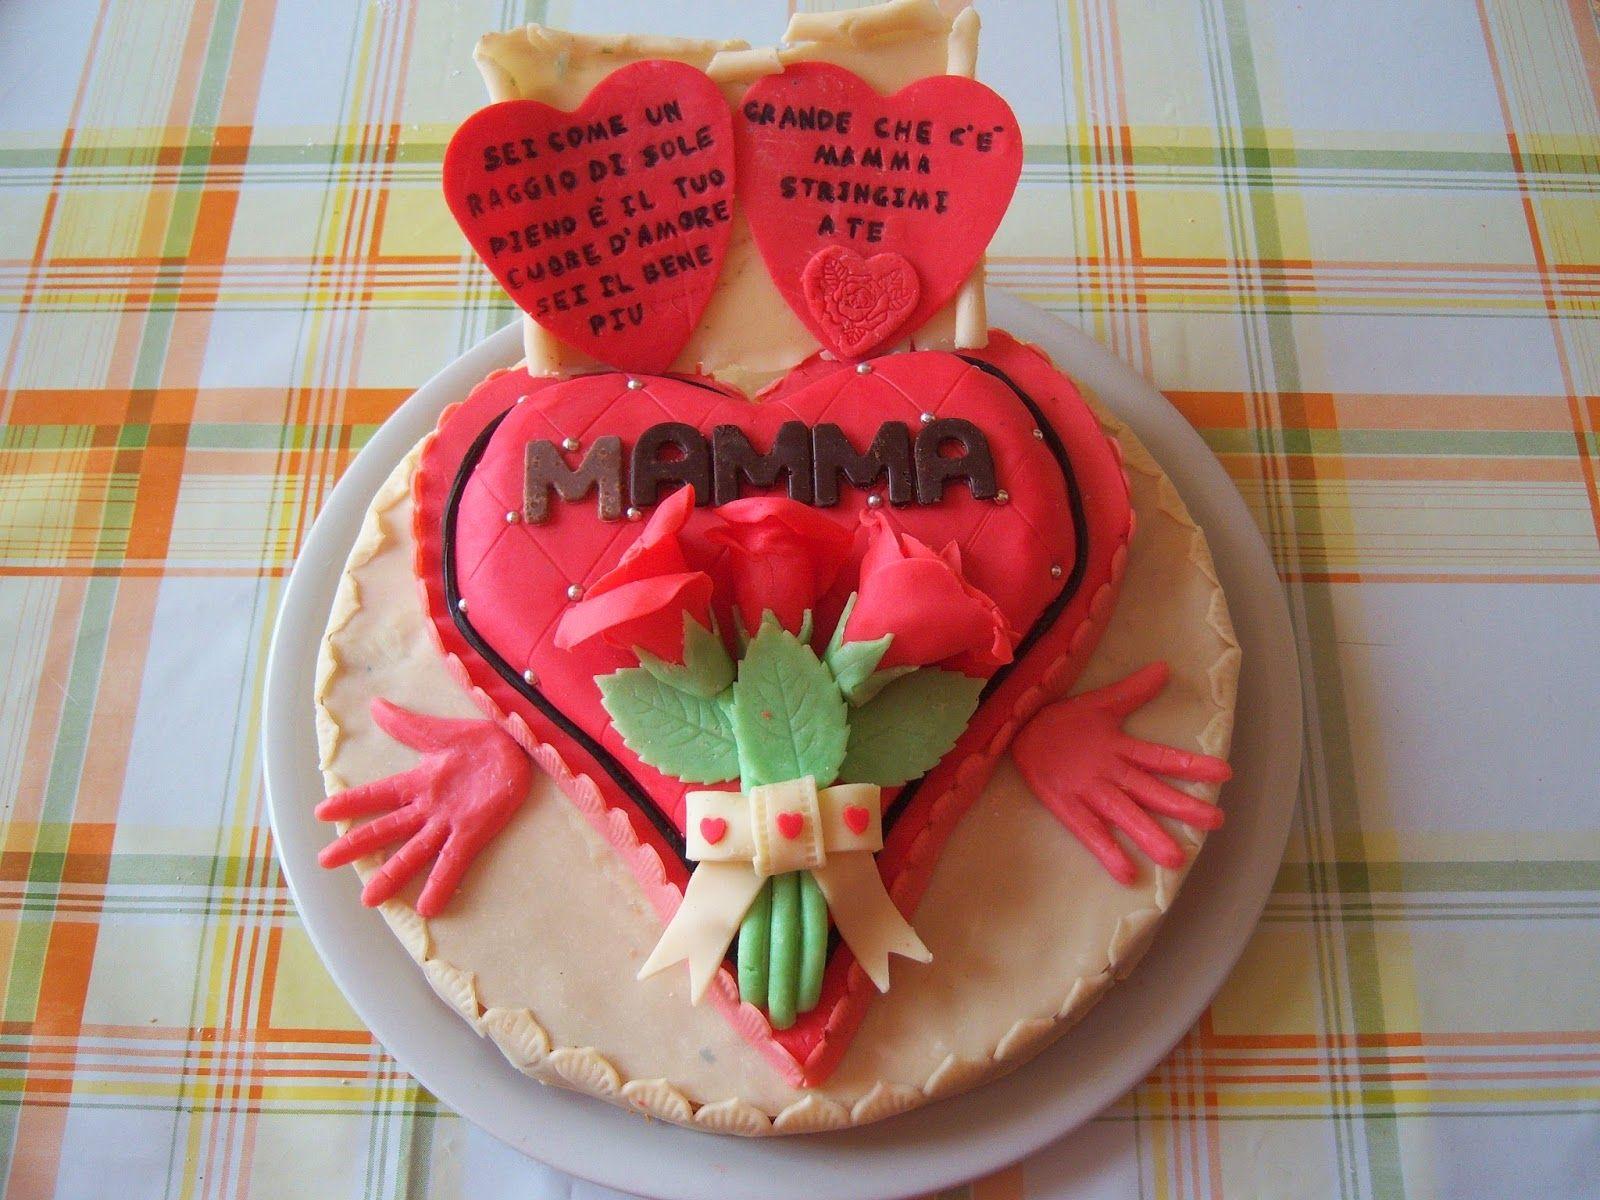 i migliori siti di cucina torta cuore di mamma ricette facili da provare pinterest cucina